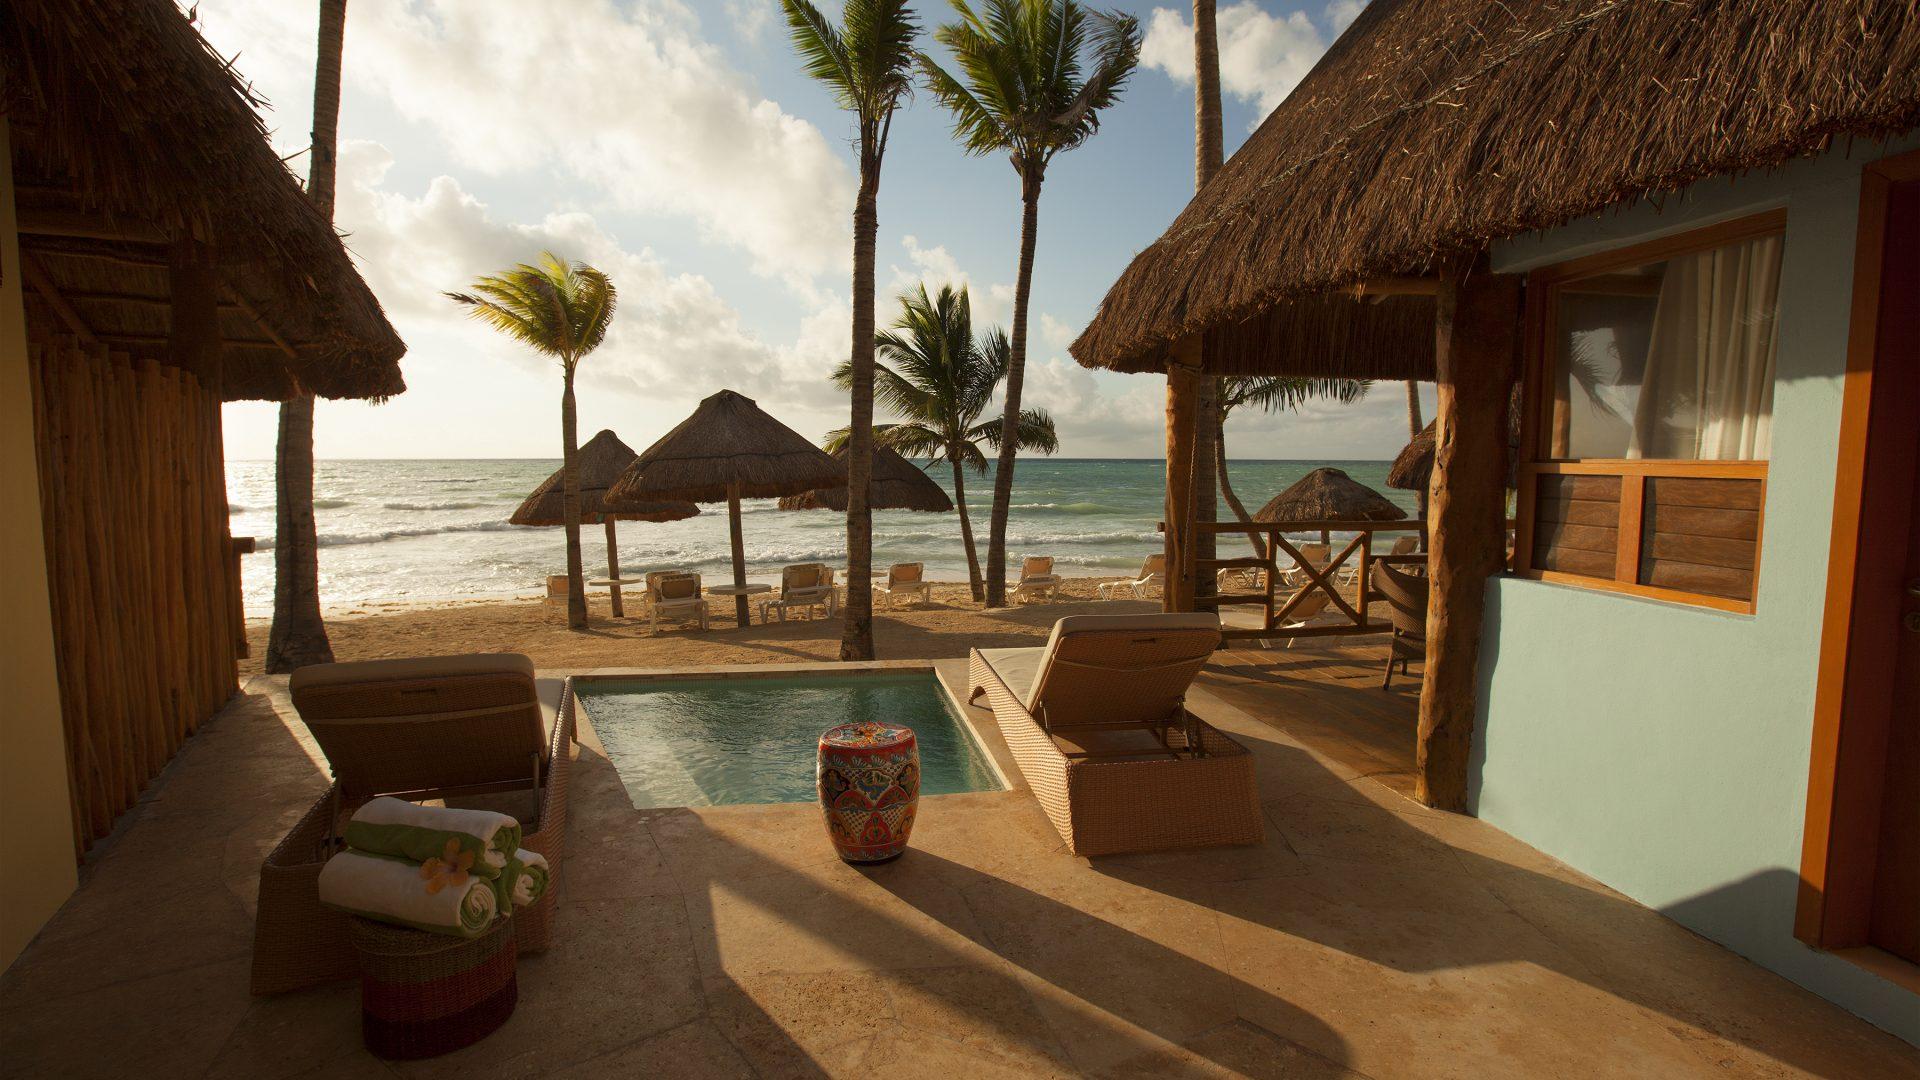 Playa del Carmen Accommodations | Mahekal Beach Resort